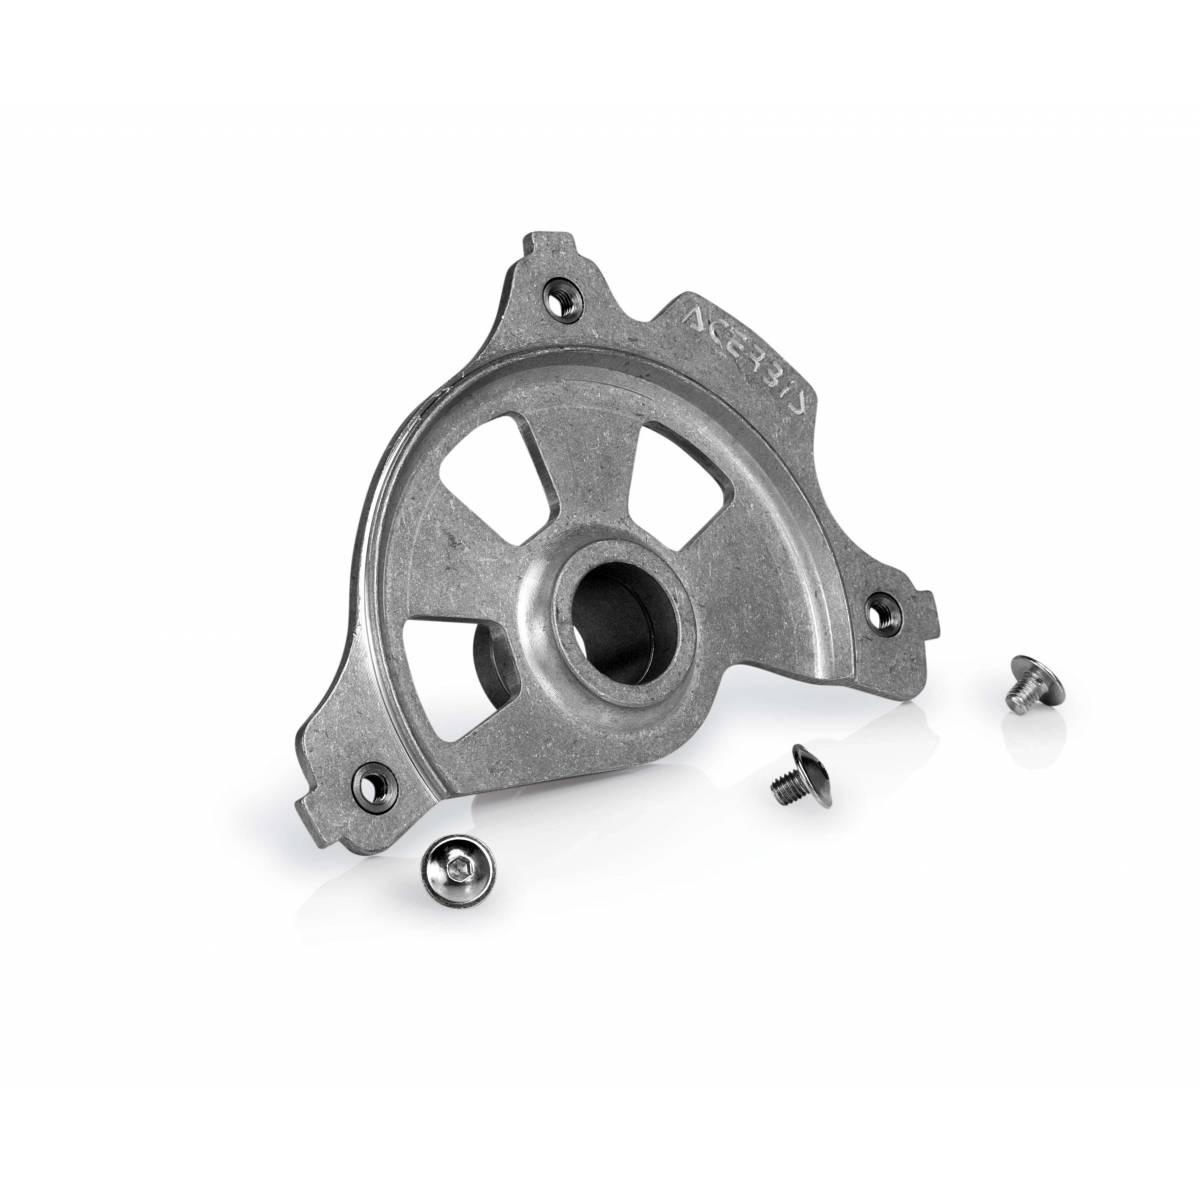 0020079 - Kit Acople Cubredisco Delantero Acerbis Ktm